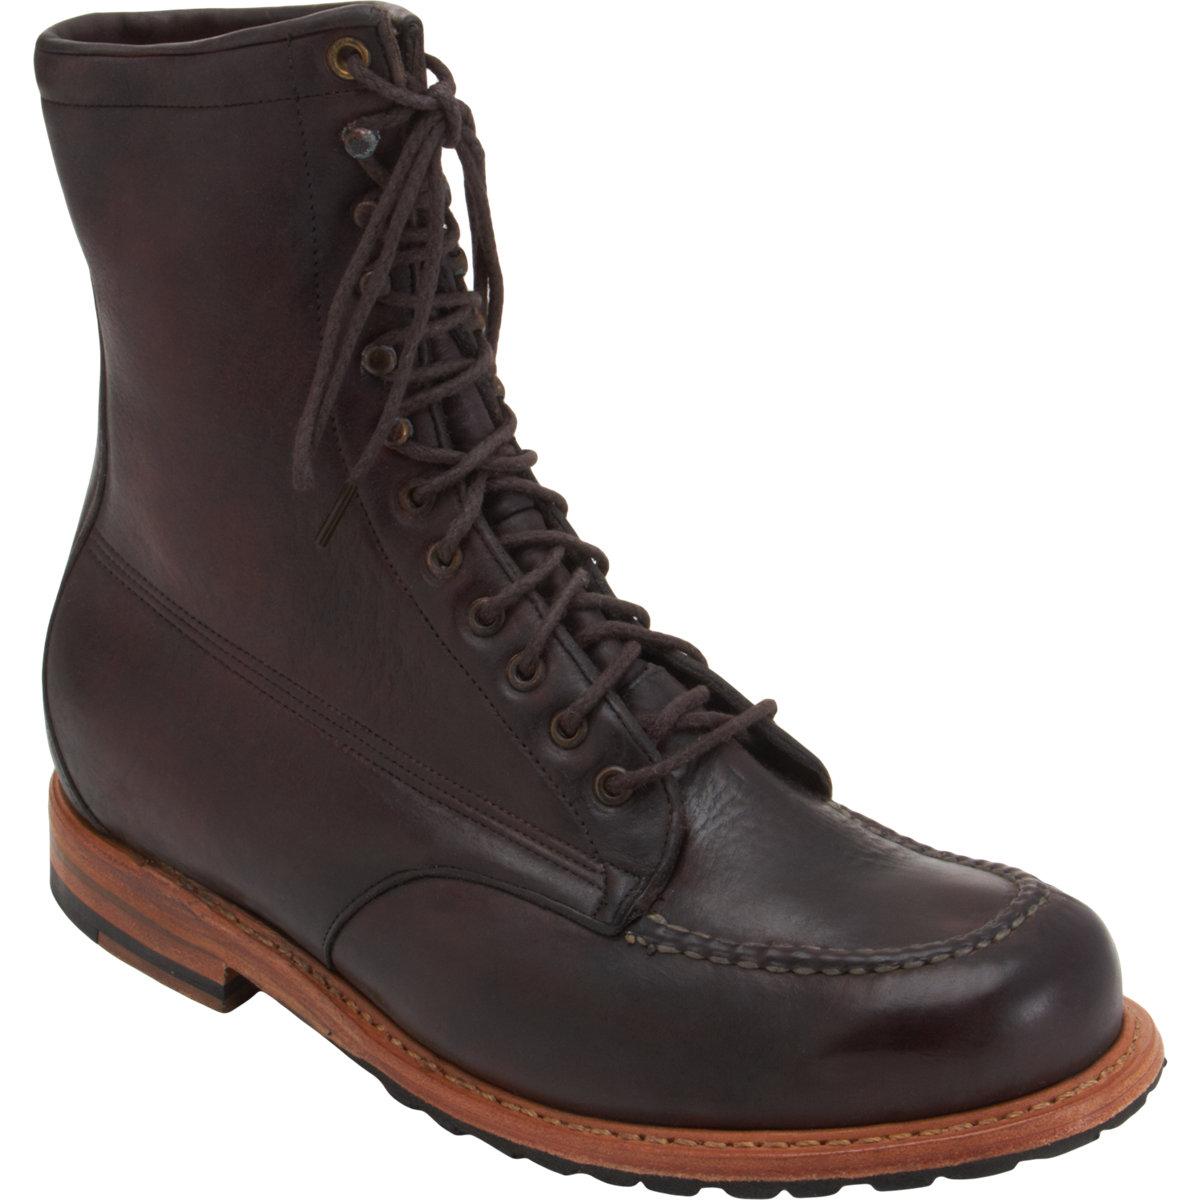 timberland blake winter 8 boot in brown for men lyst. Black Bedroom Furniture Sets. Home Design Ideas